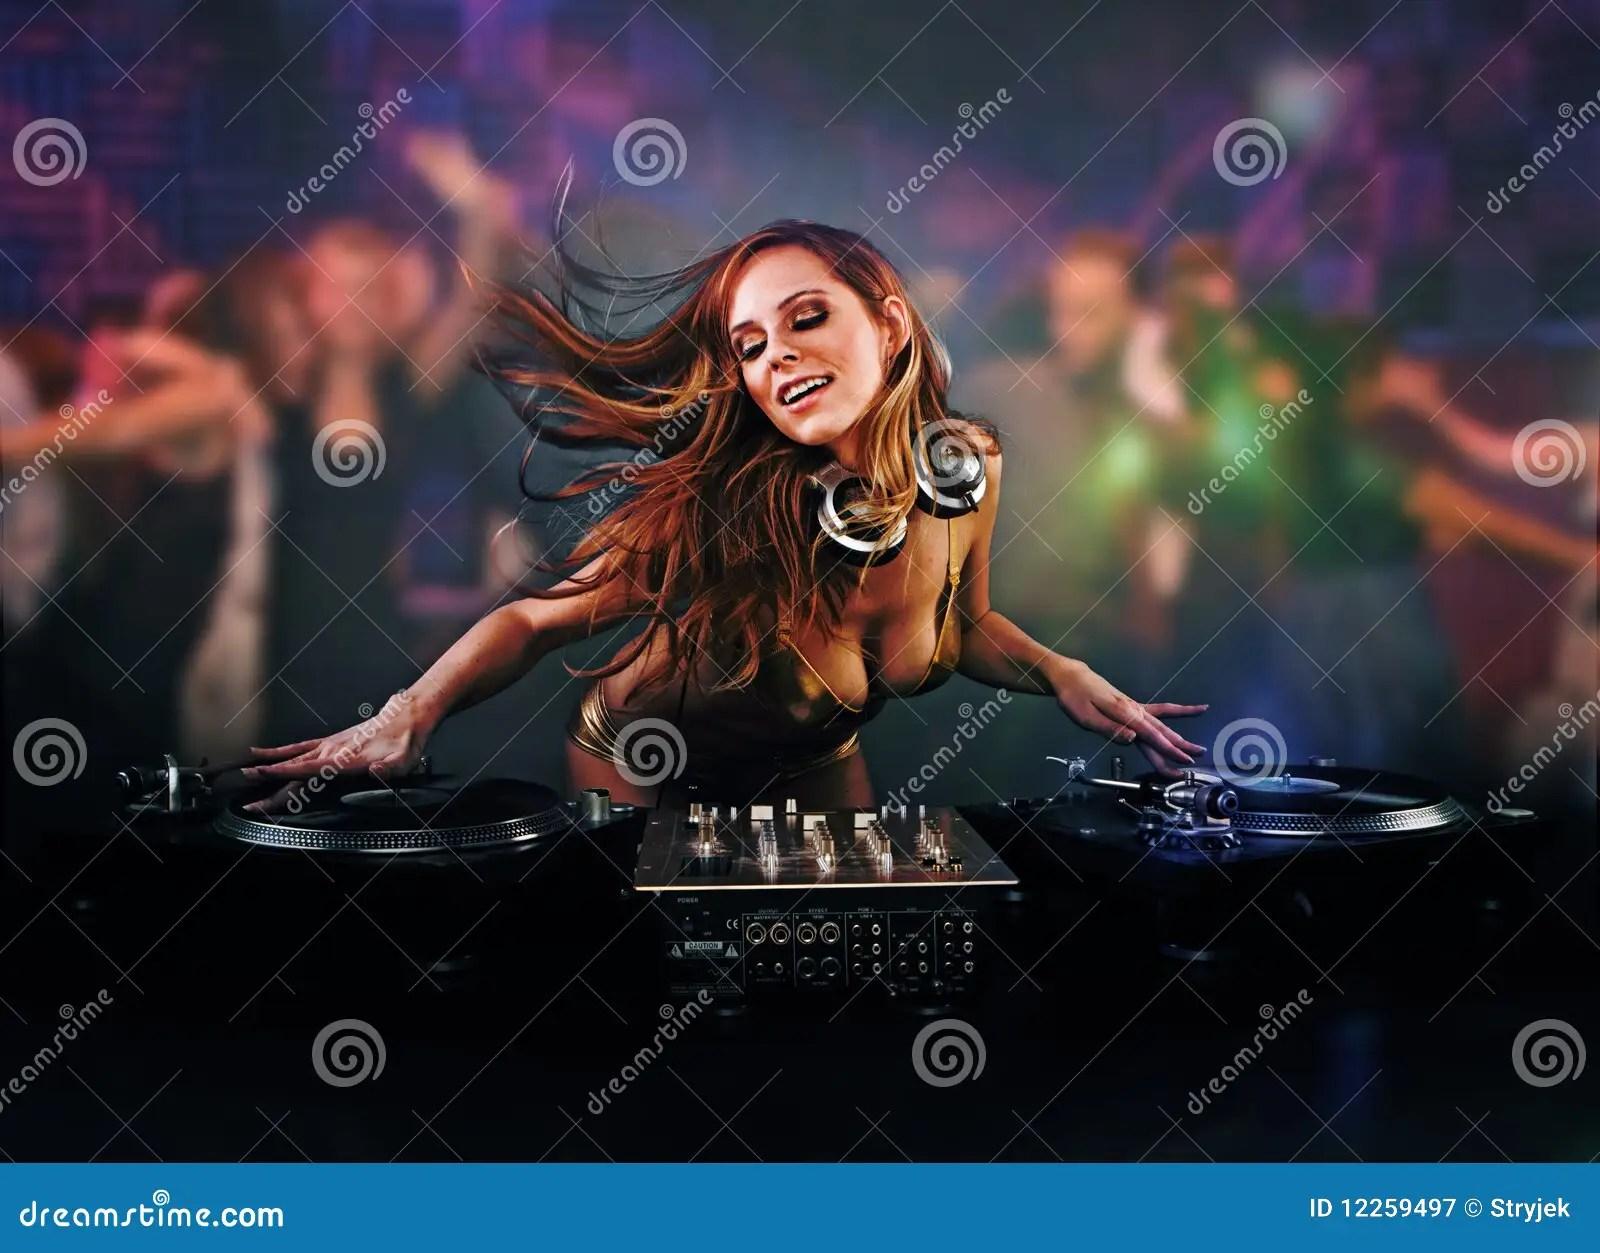 Beautiful Wallpapers 3d Animation Beautiful Dj Girl Royalty Free Stock Photography Image